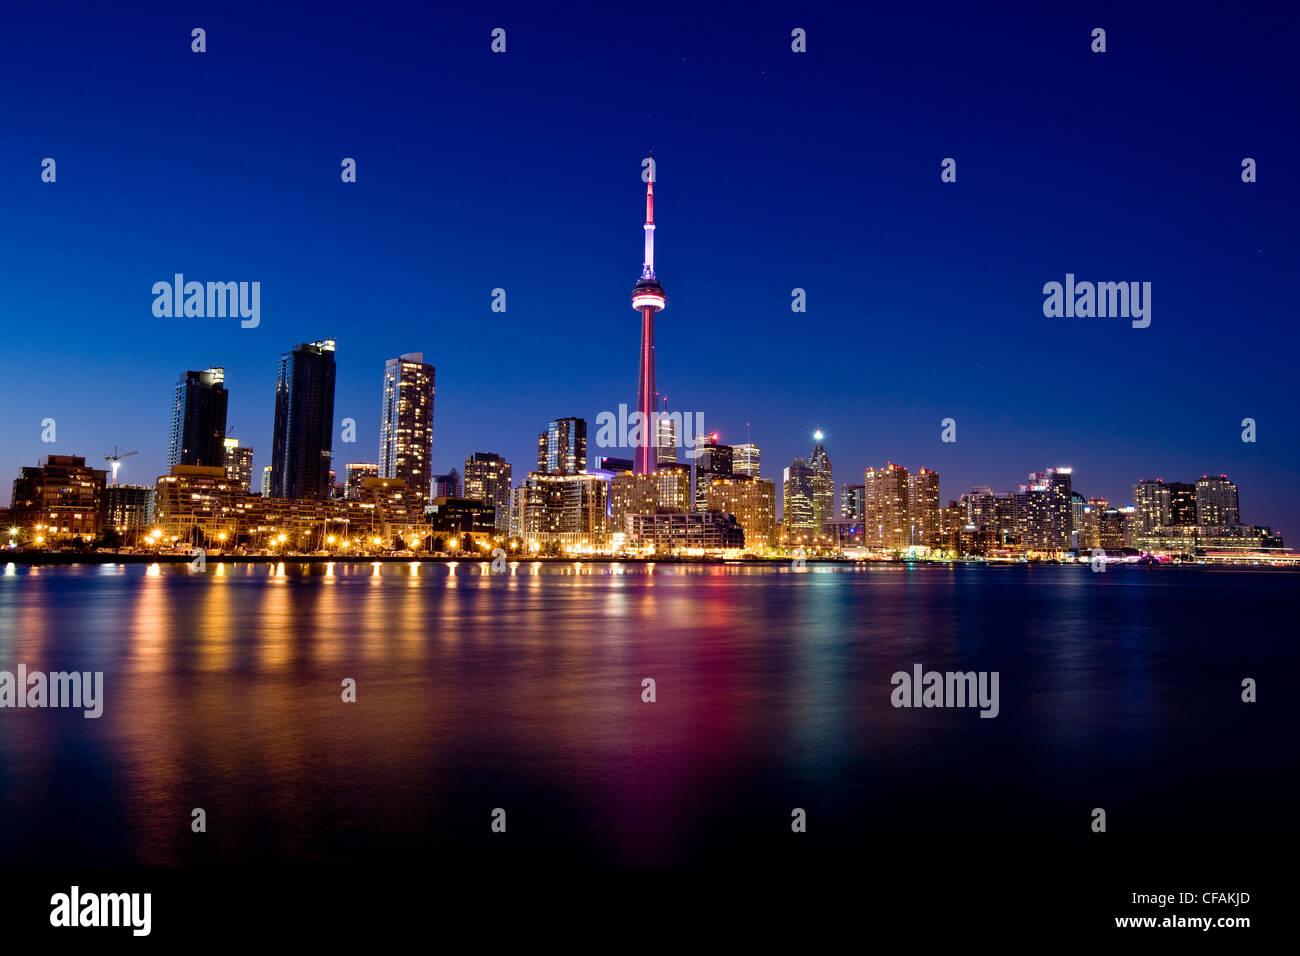 Toronto Skyline at night vu de l'aéroport de l'île, l'Ontario, Canada. Banque D'Images